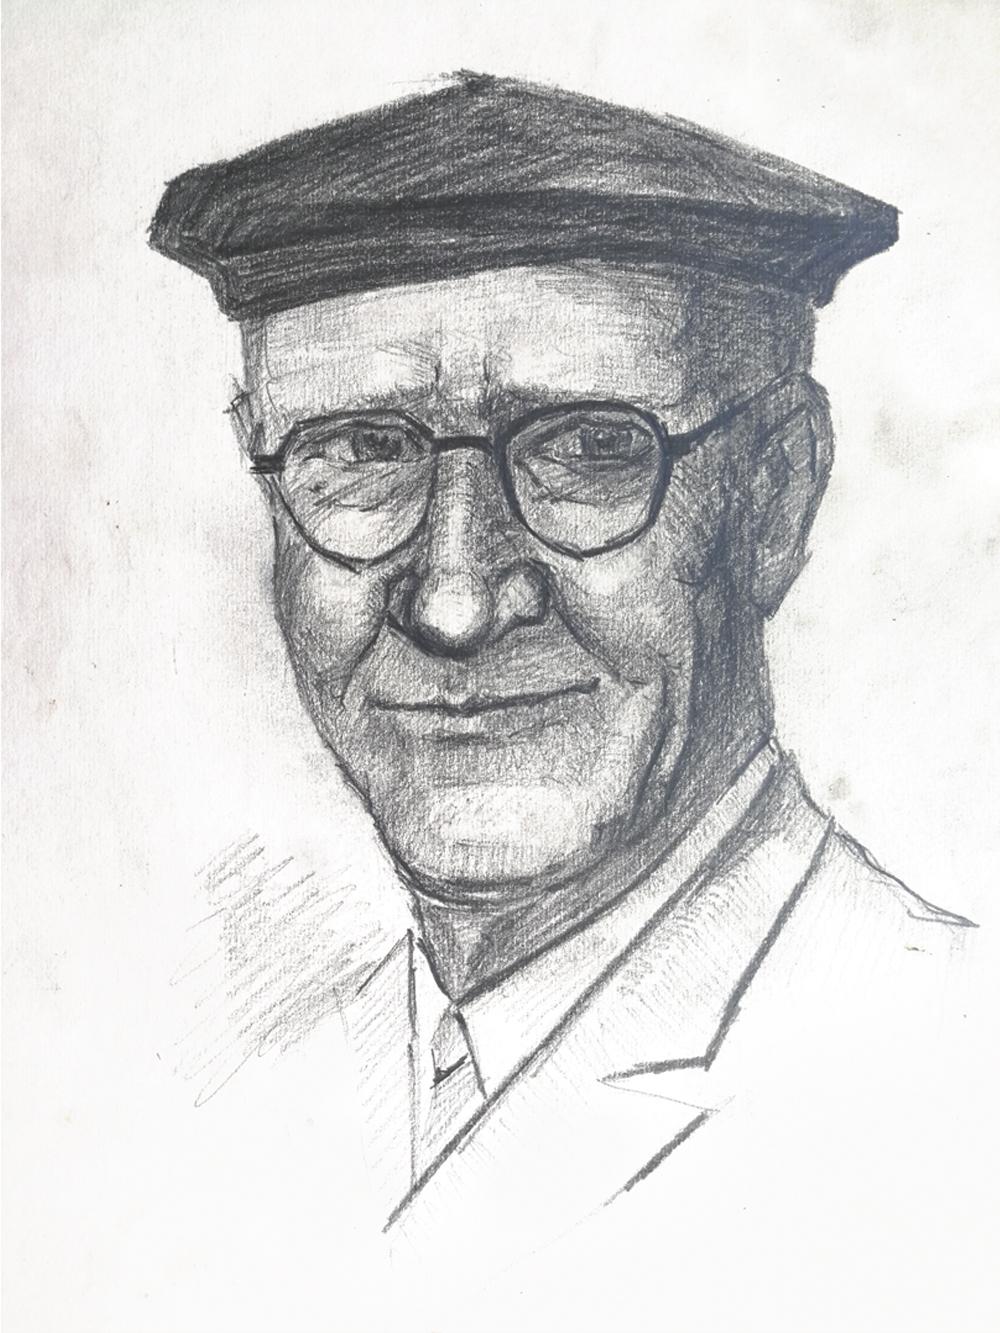 Kayetano Kareaga. Jose Kareaga